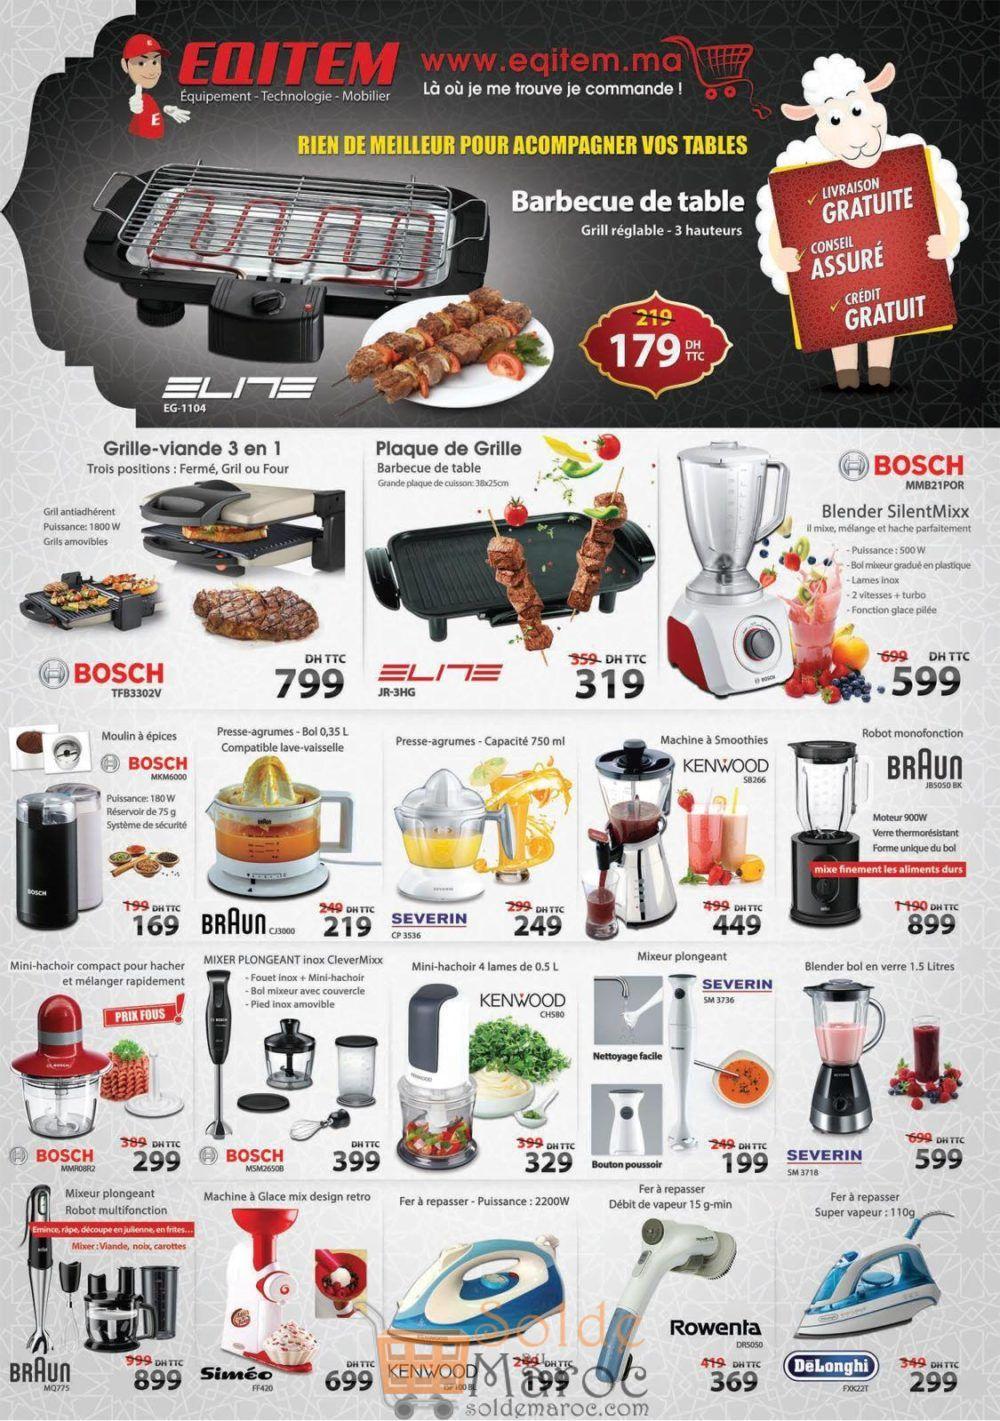 Catalogue Eqitem Electro Spéciale عيد الأضحى Août 2018